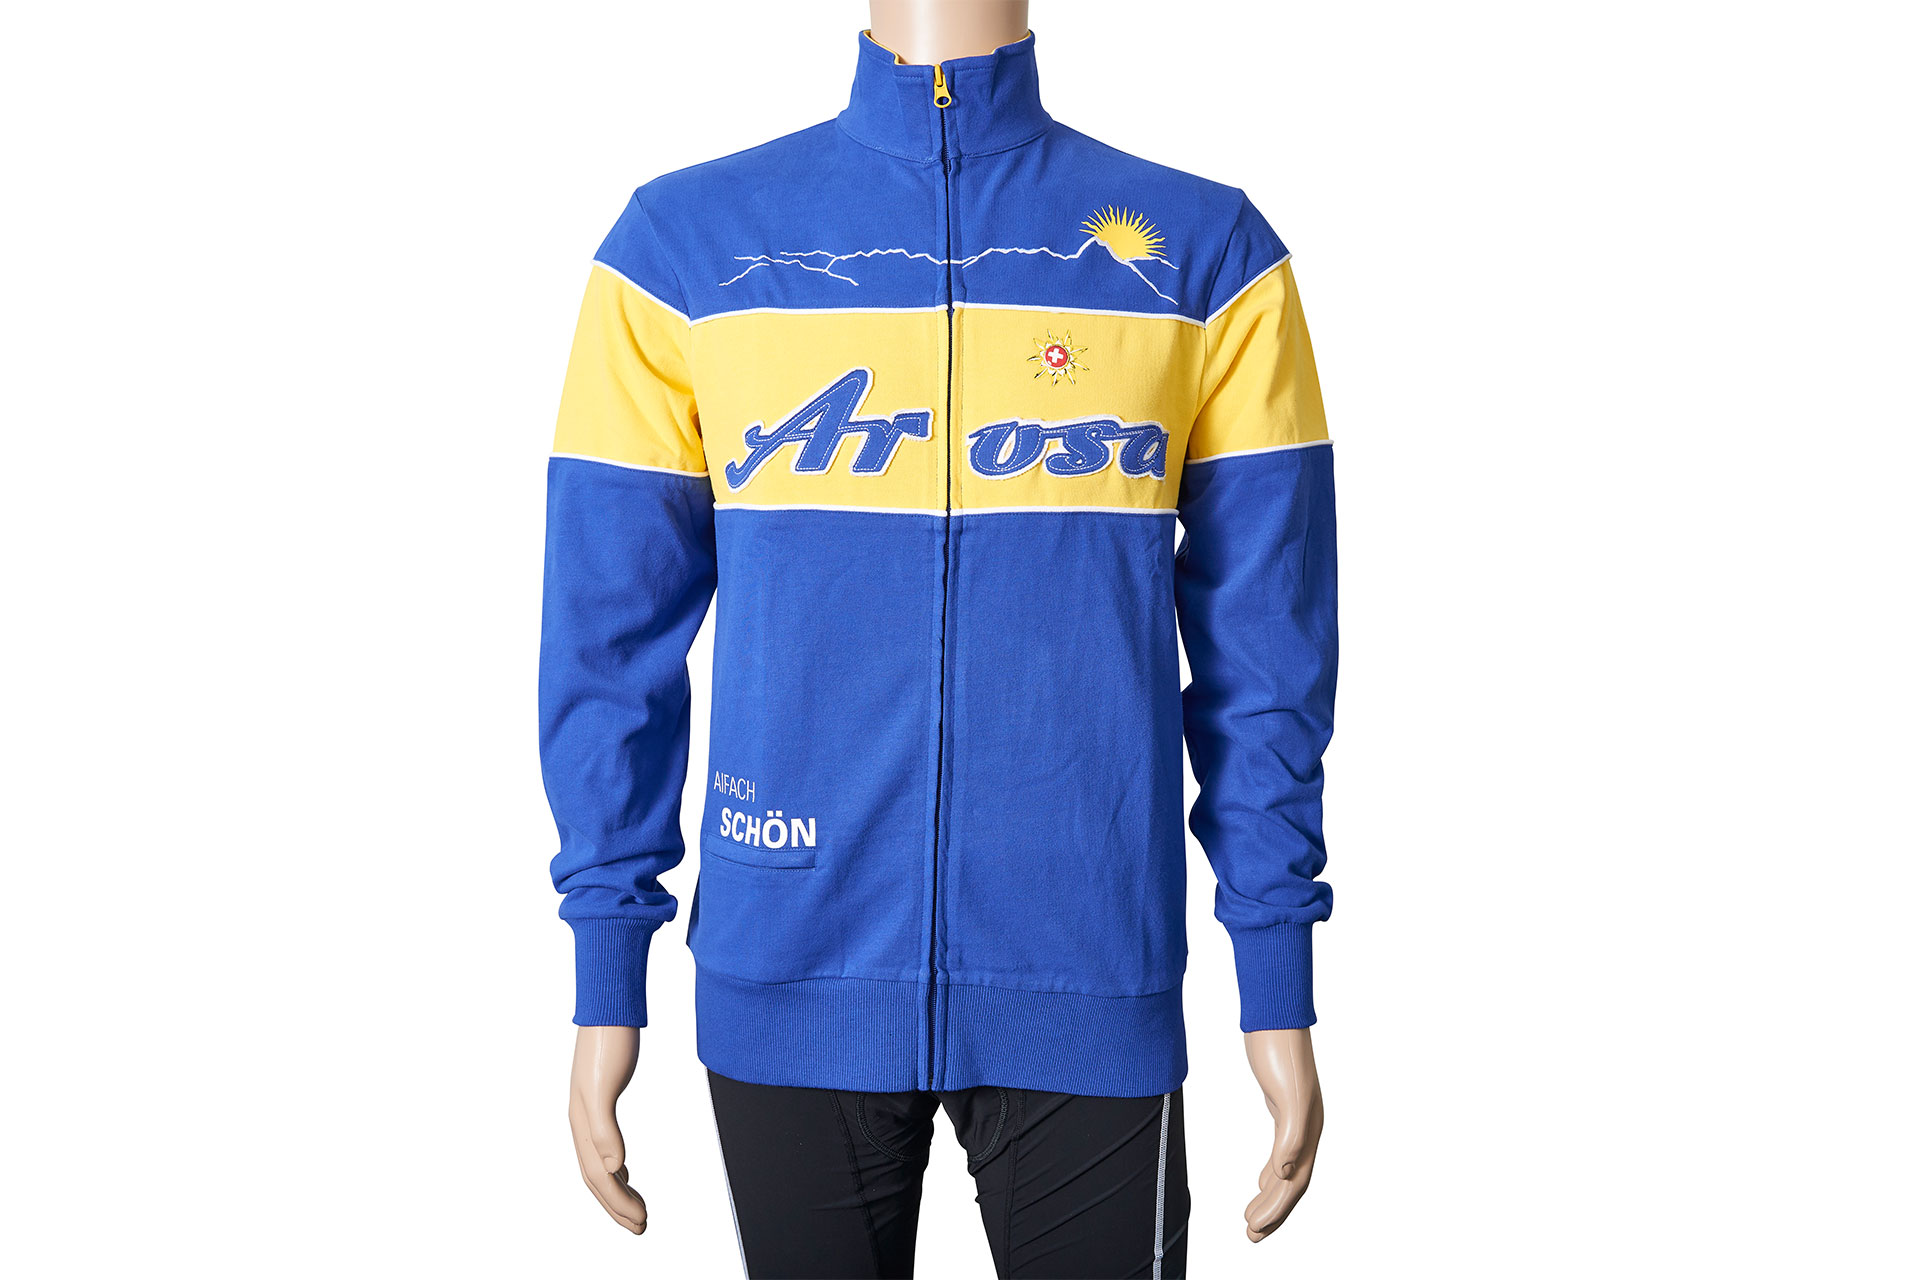 0a6620df898a98 Arosa Zip-Jacke unisex online bestellen - arosa.shop